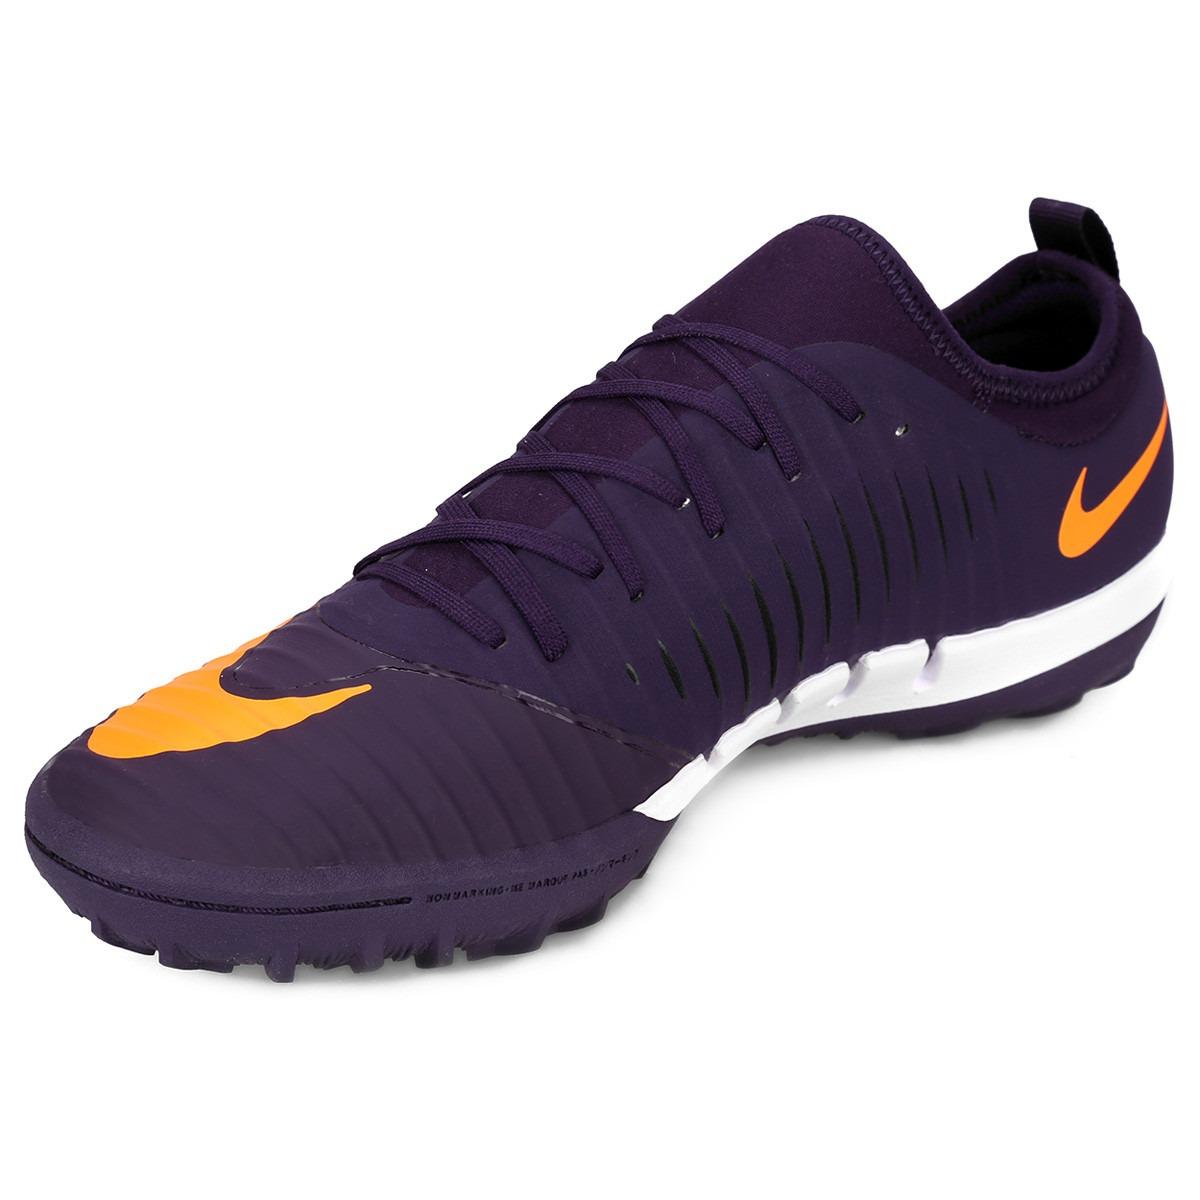 separation shoes 7890b c0772 Botines Nike Mercurialx Finale Ii Tf - Originales